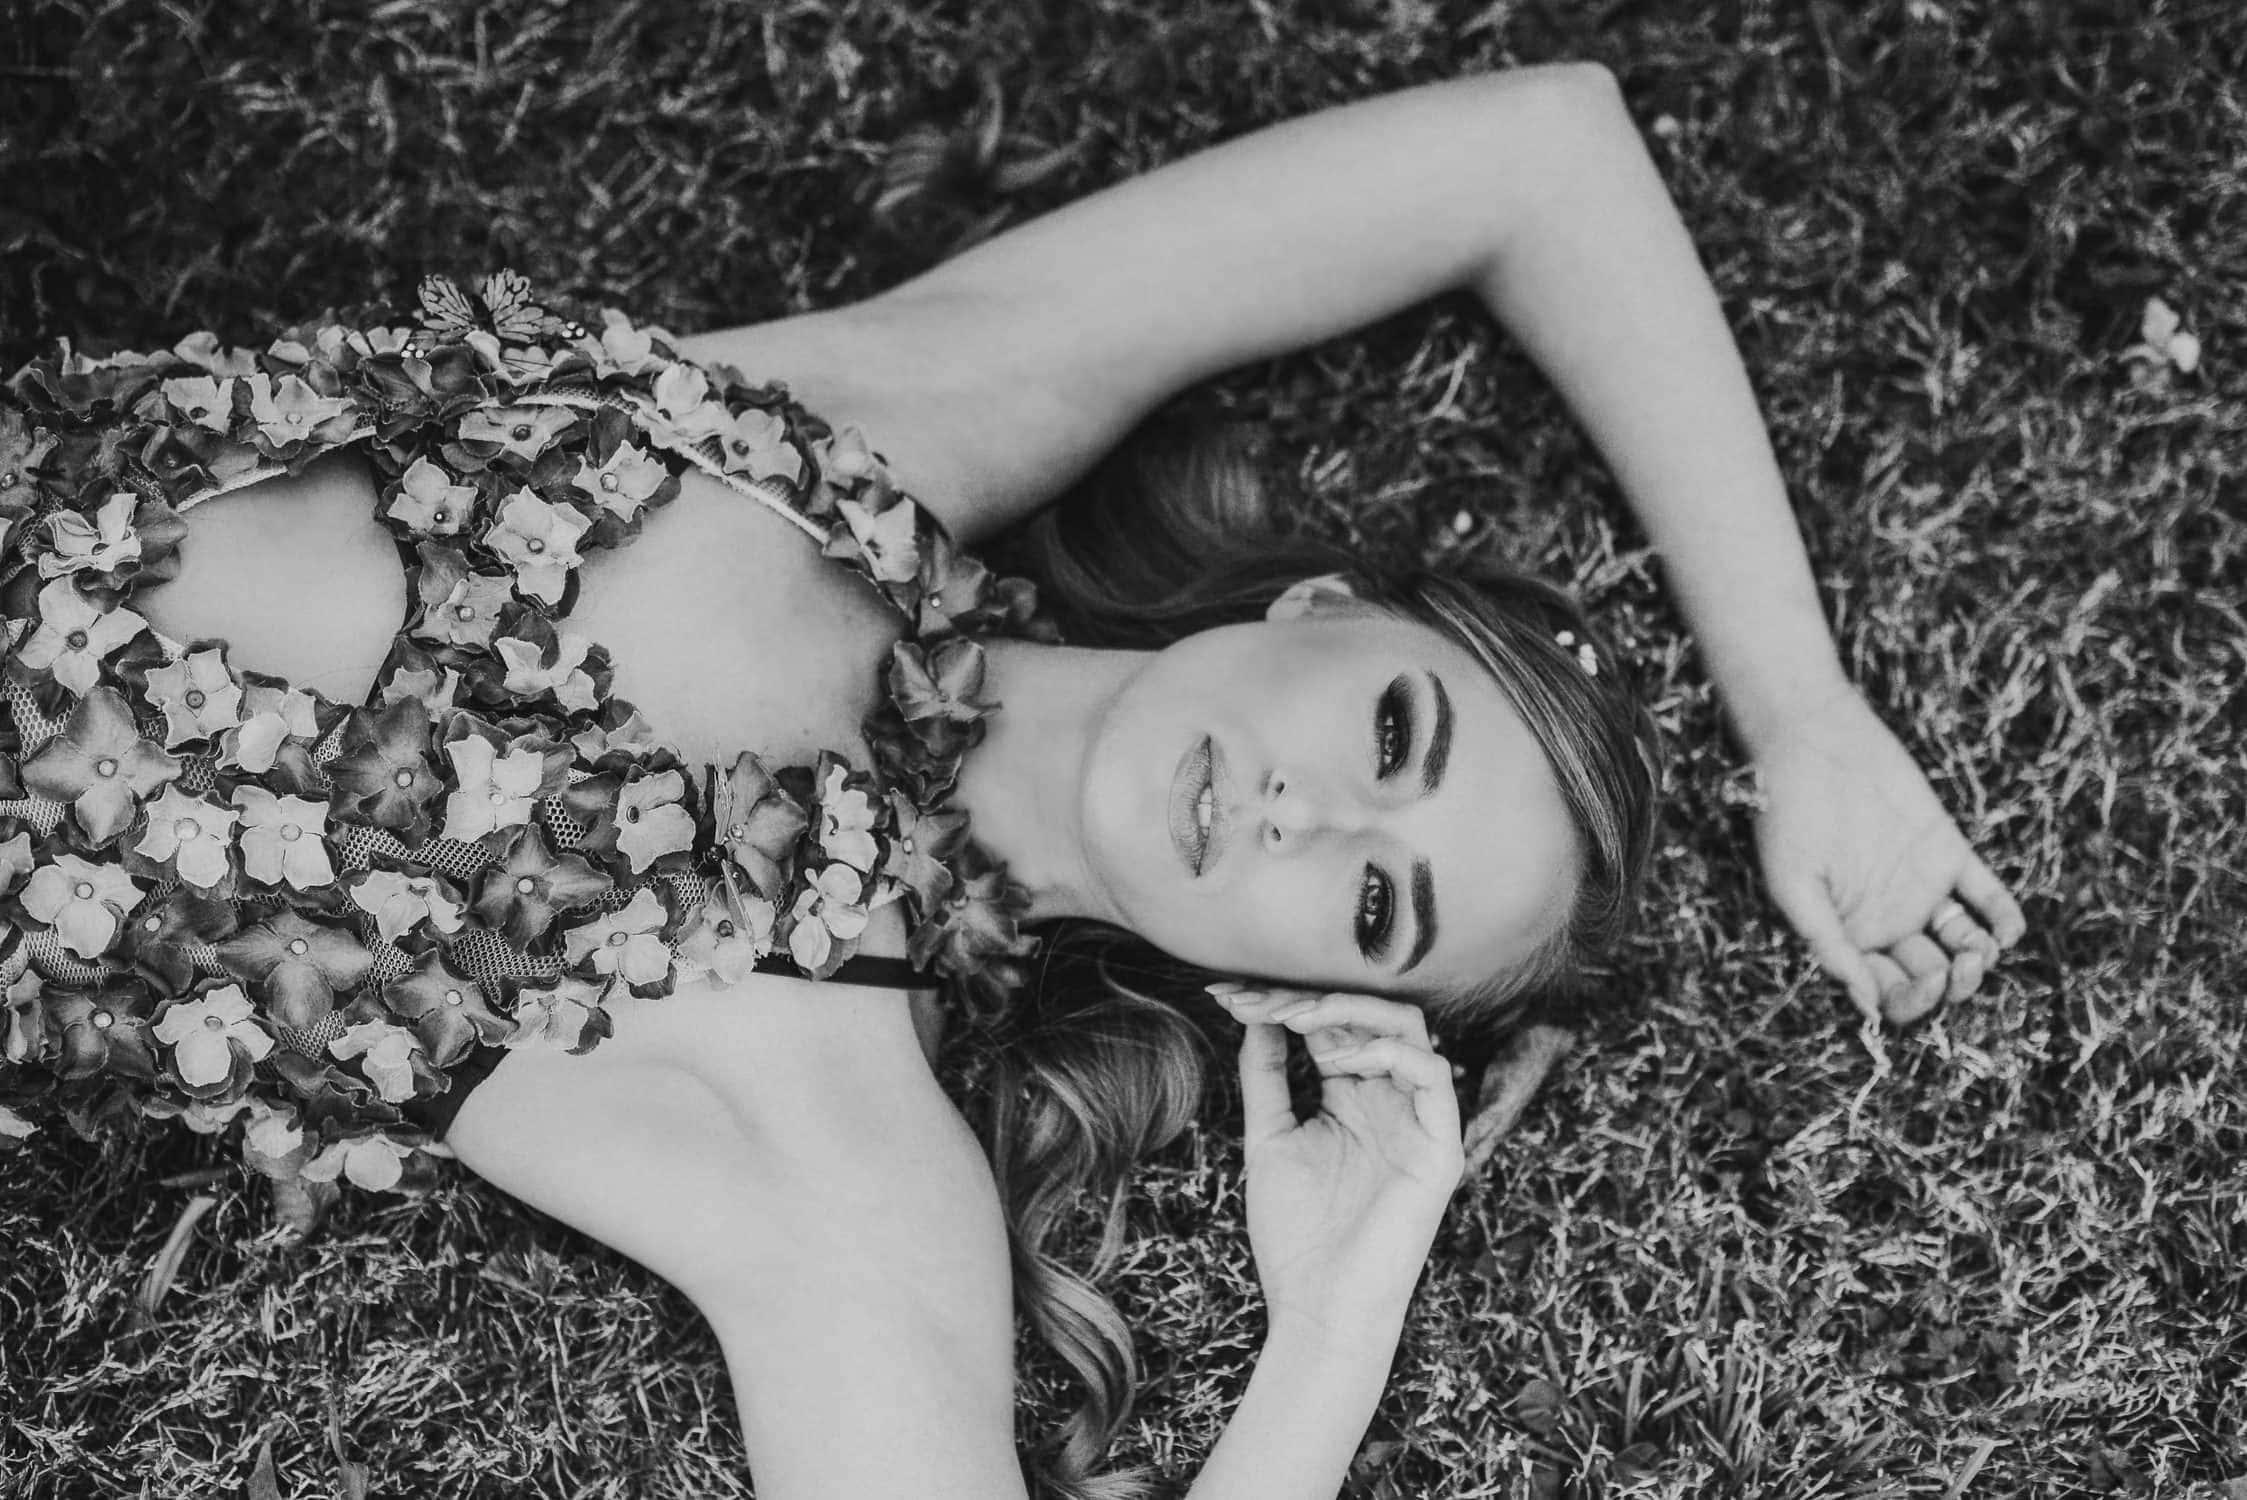 houston portrait photographer, black and white image